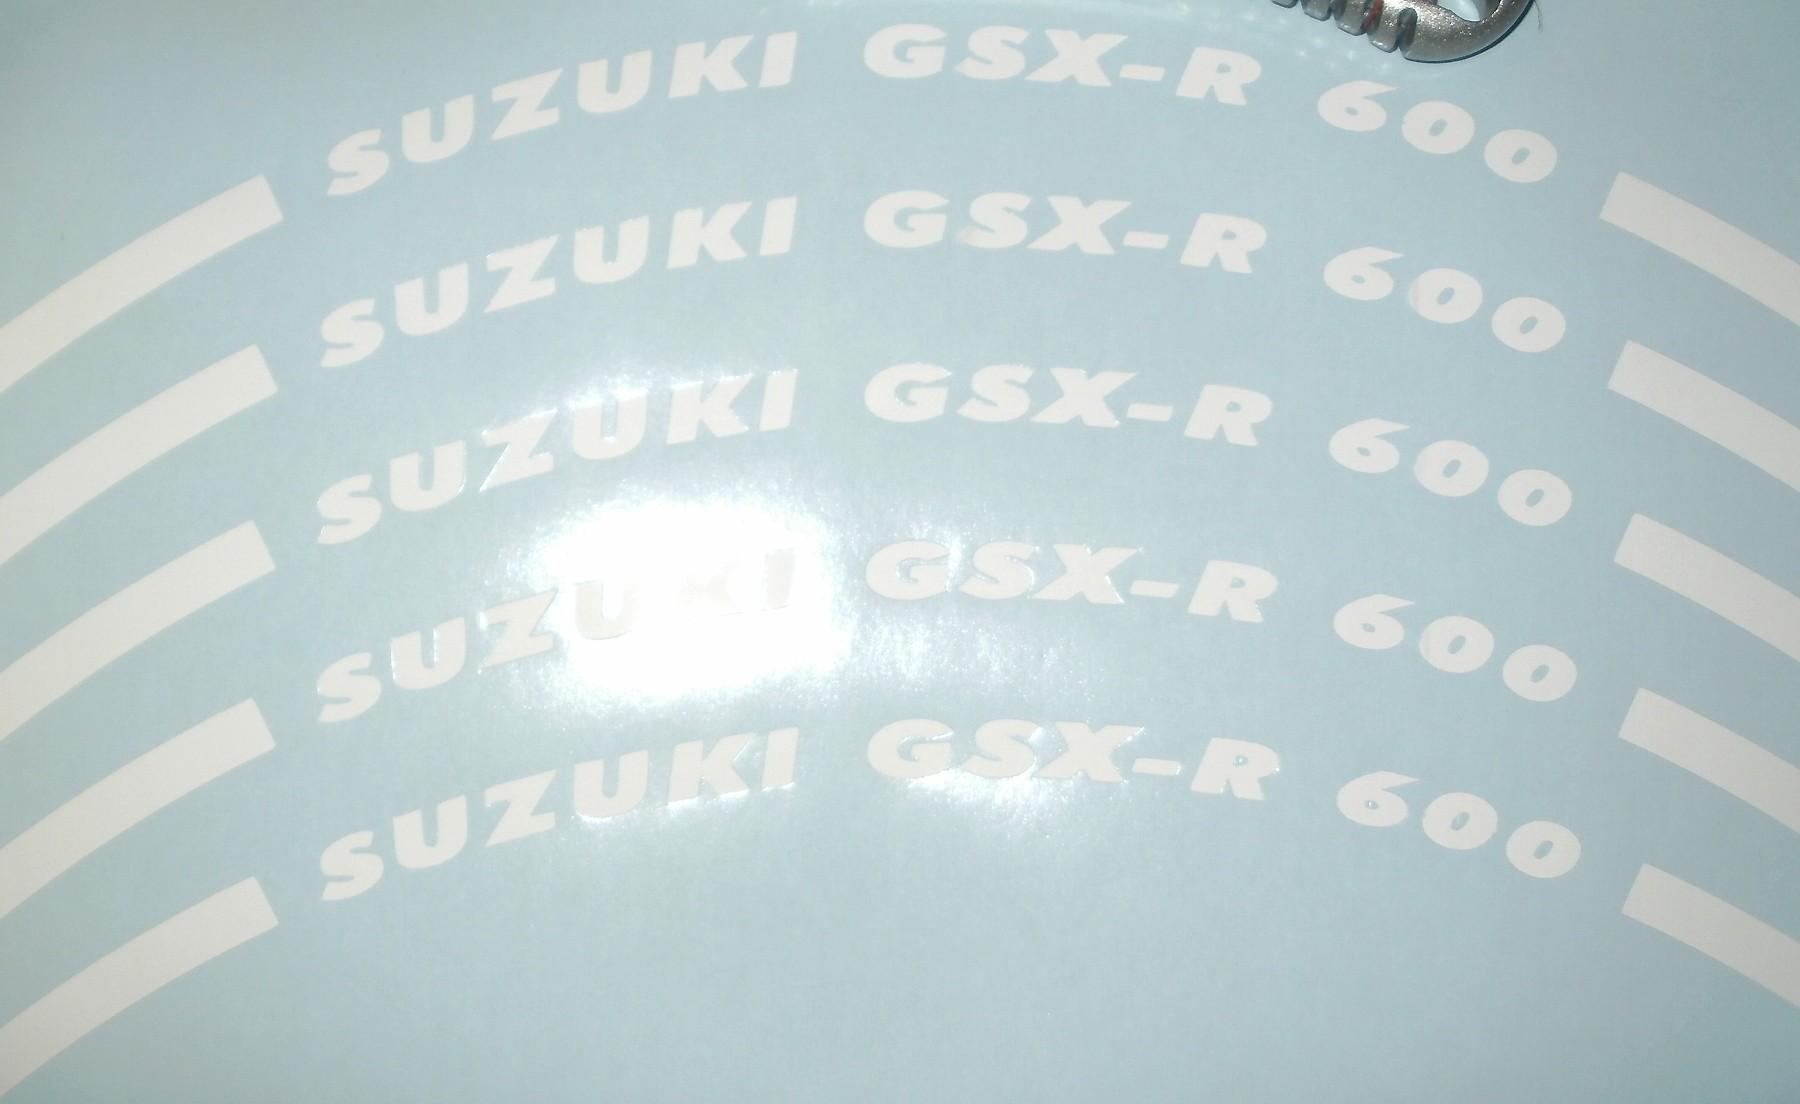 Felgenrandaufkleber Suzuki GSX-R 600 weiss, matt